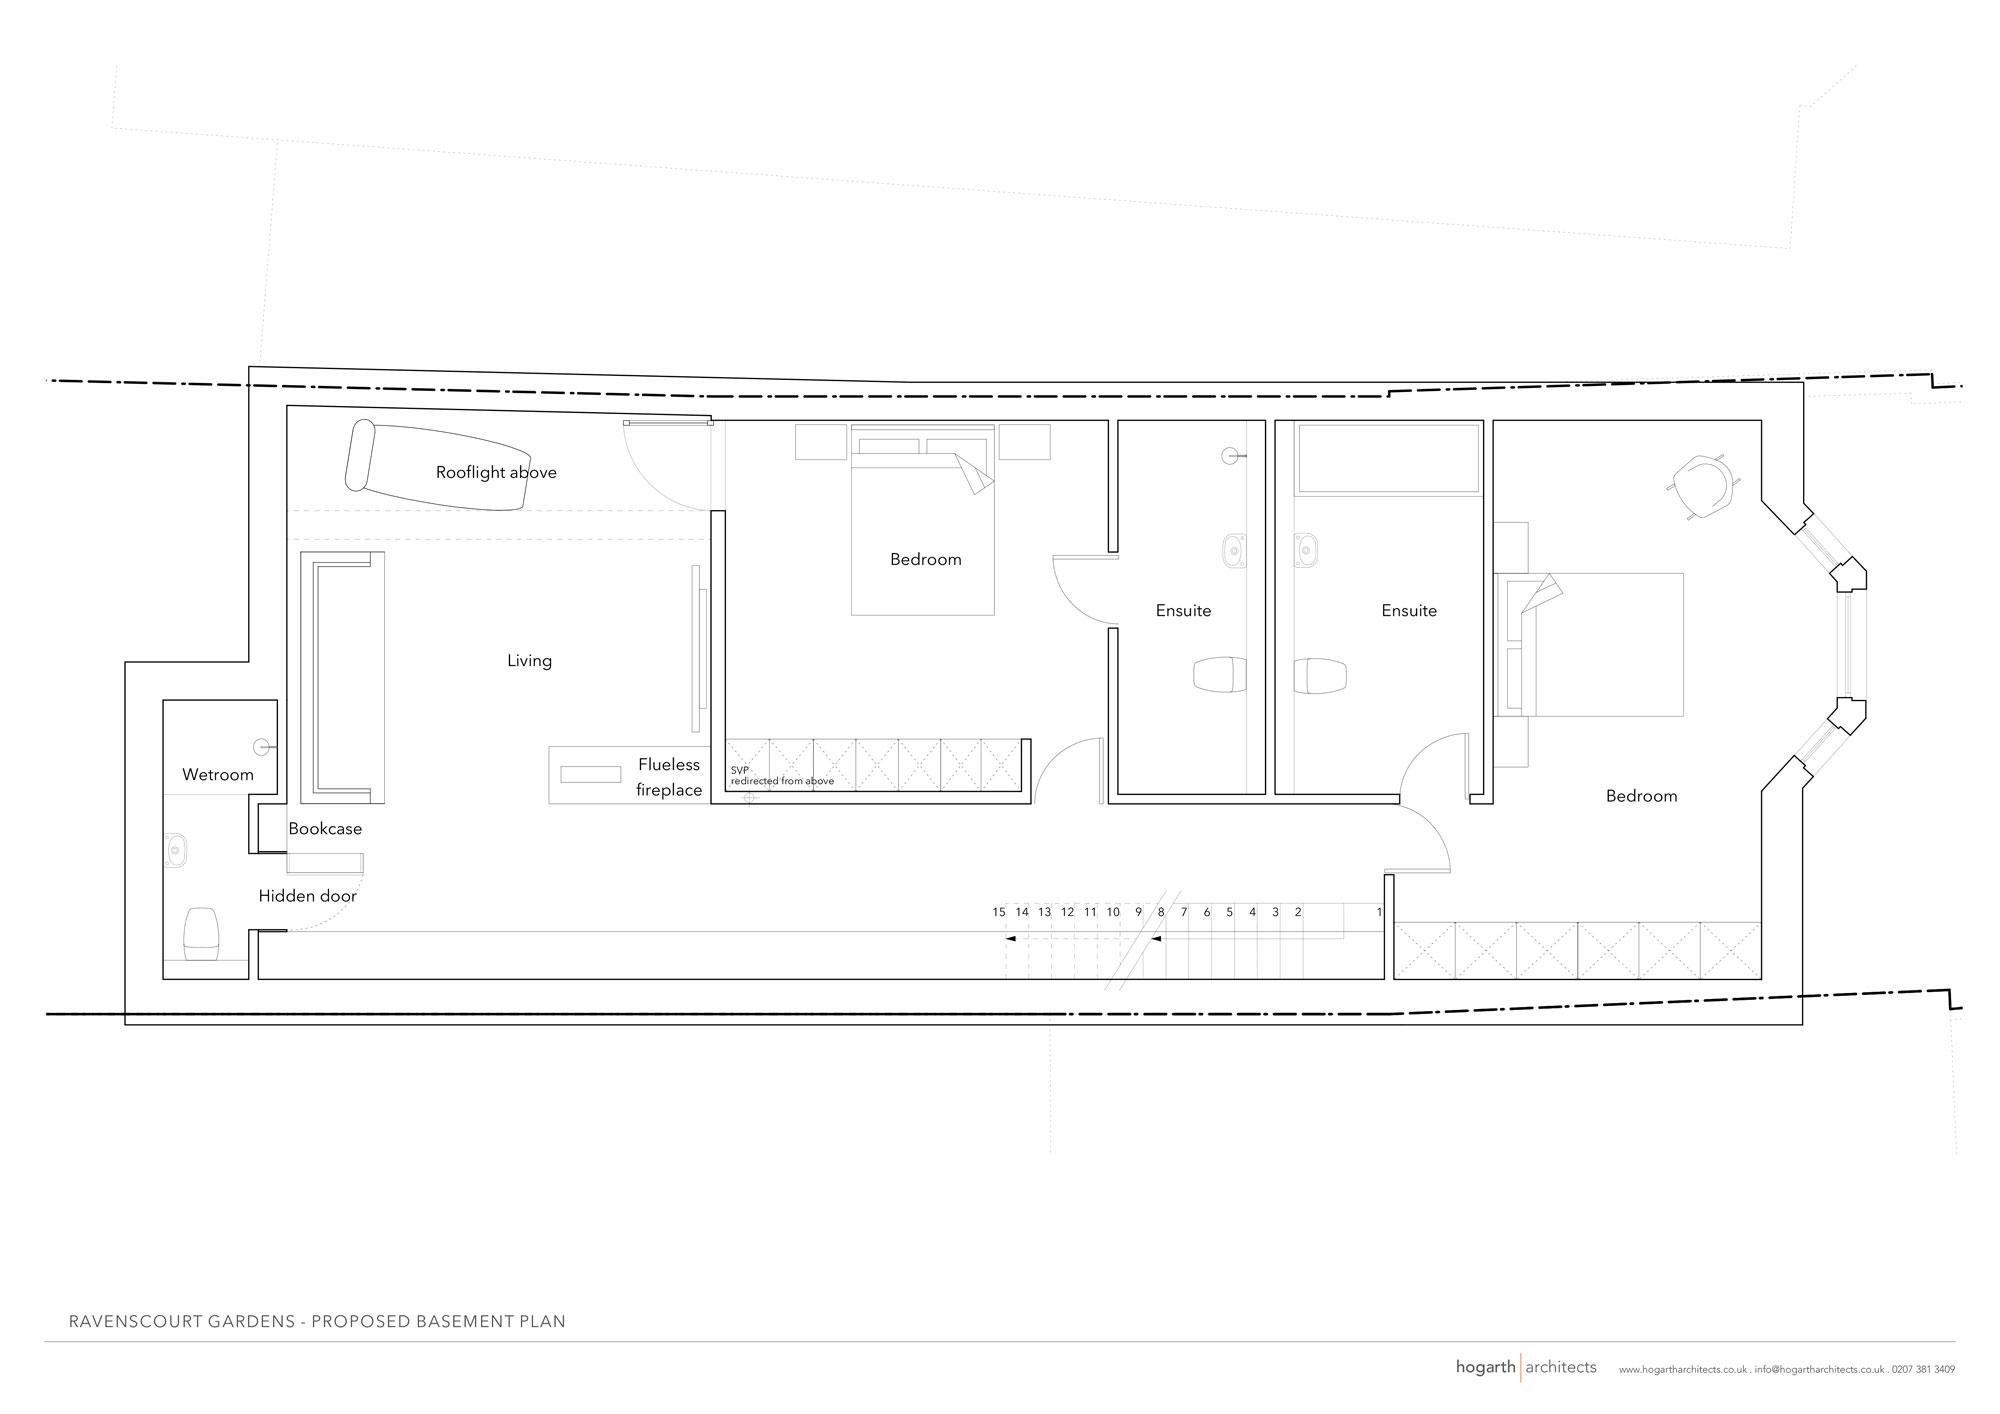 L(-2)370 Proposed Basement Plan.jpg